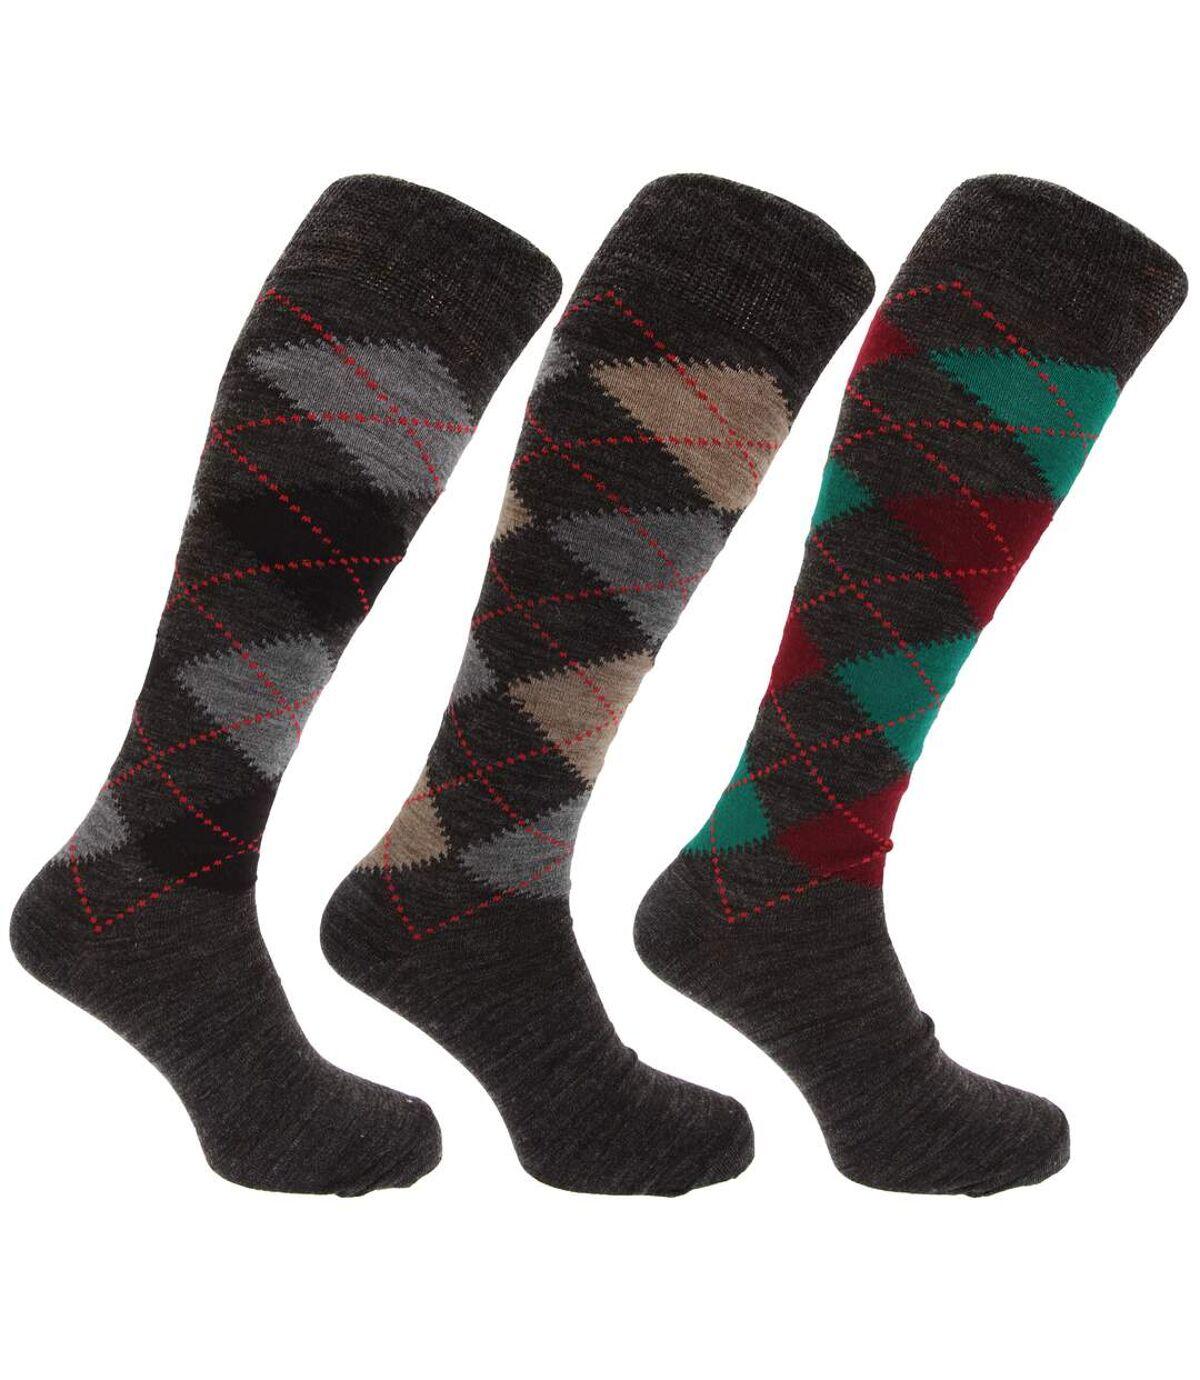 Mens Traditional Argyle Pattern Long Length Lambs Wool Blend Socks (Pack Of 3) (Shades of Grey) - UTMB277